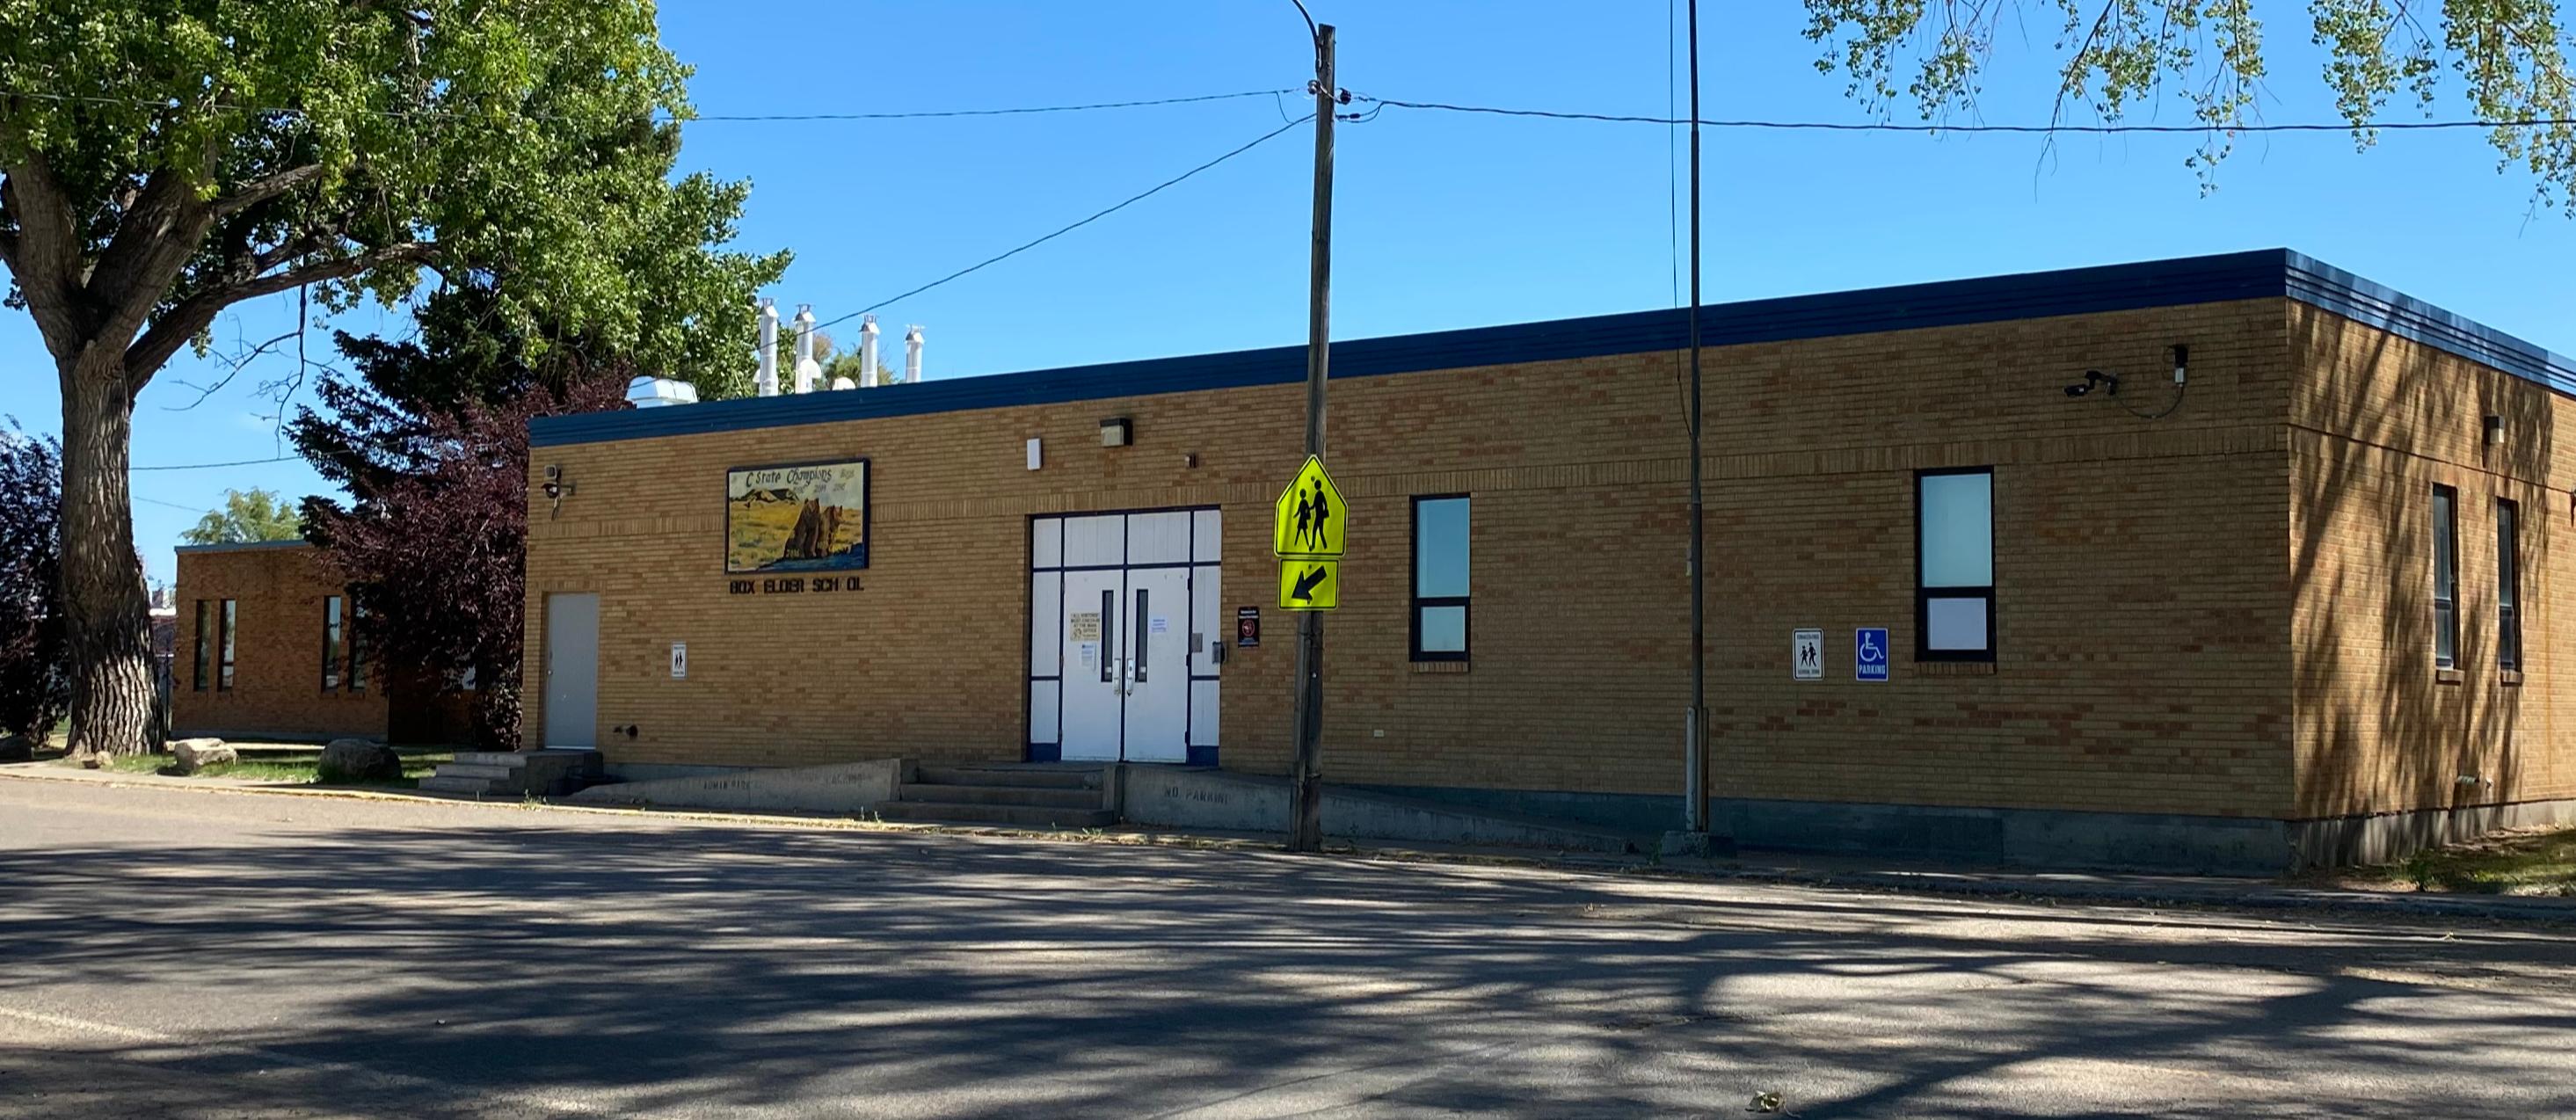 Box Elder School